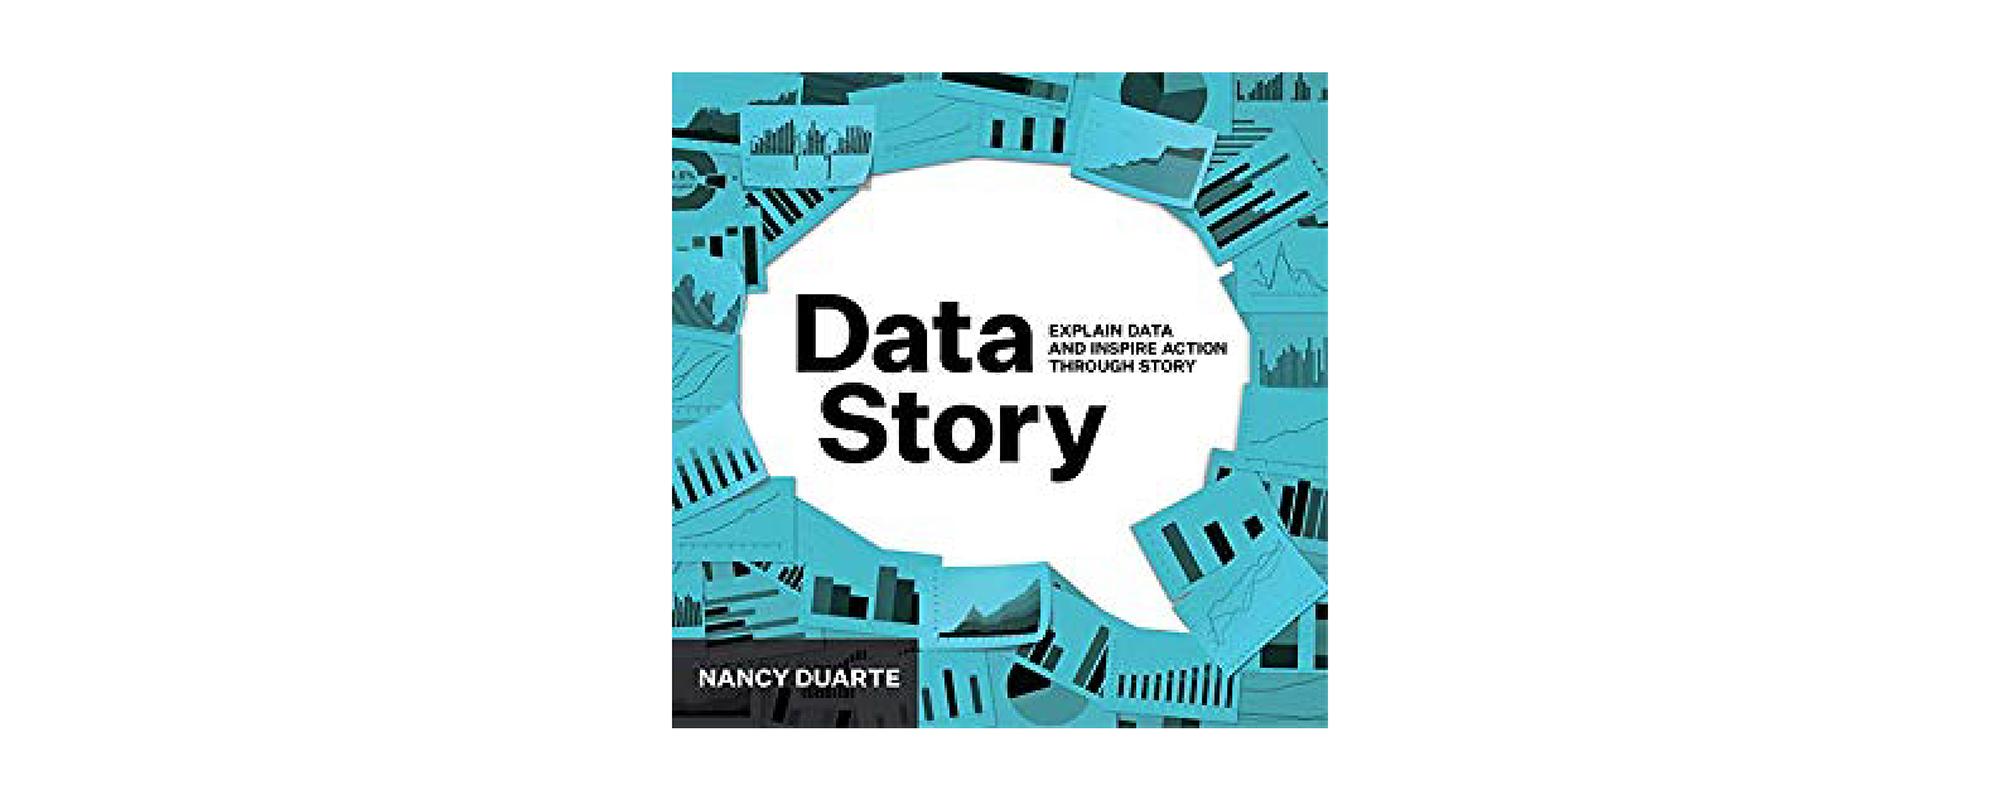 DataStory: Explain Data and Inspire Action Through Story by Nancy Duarte